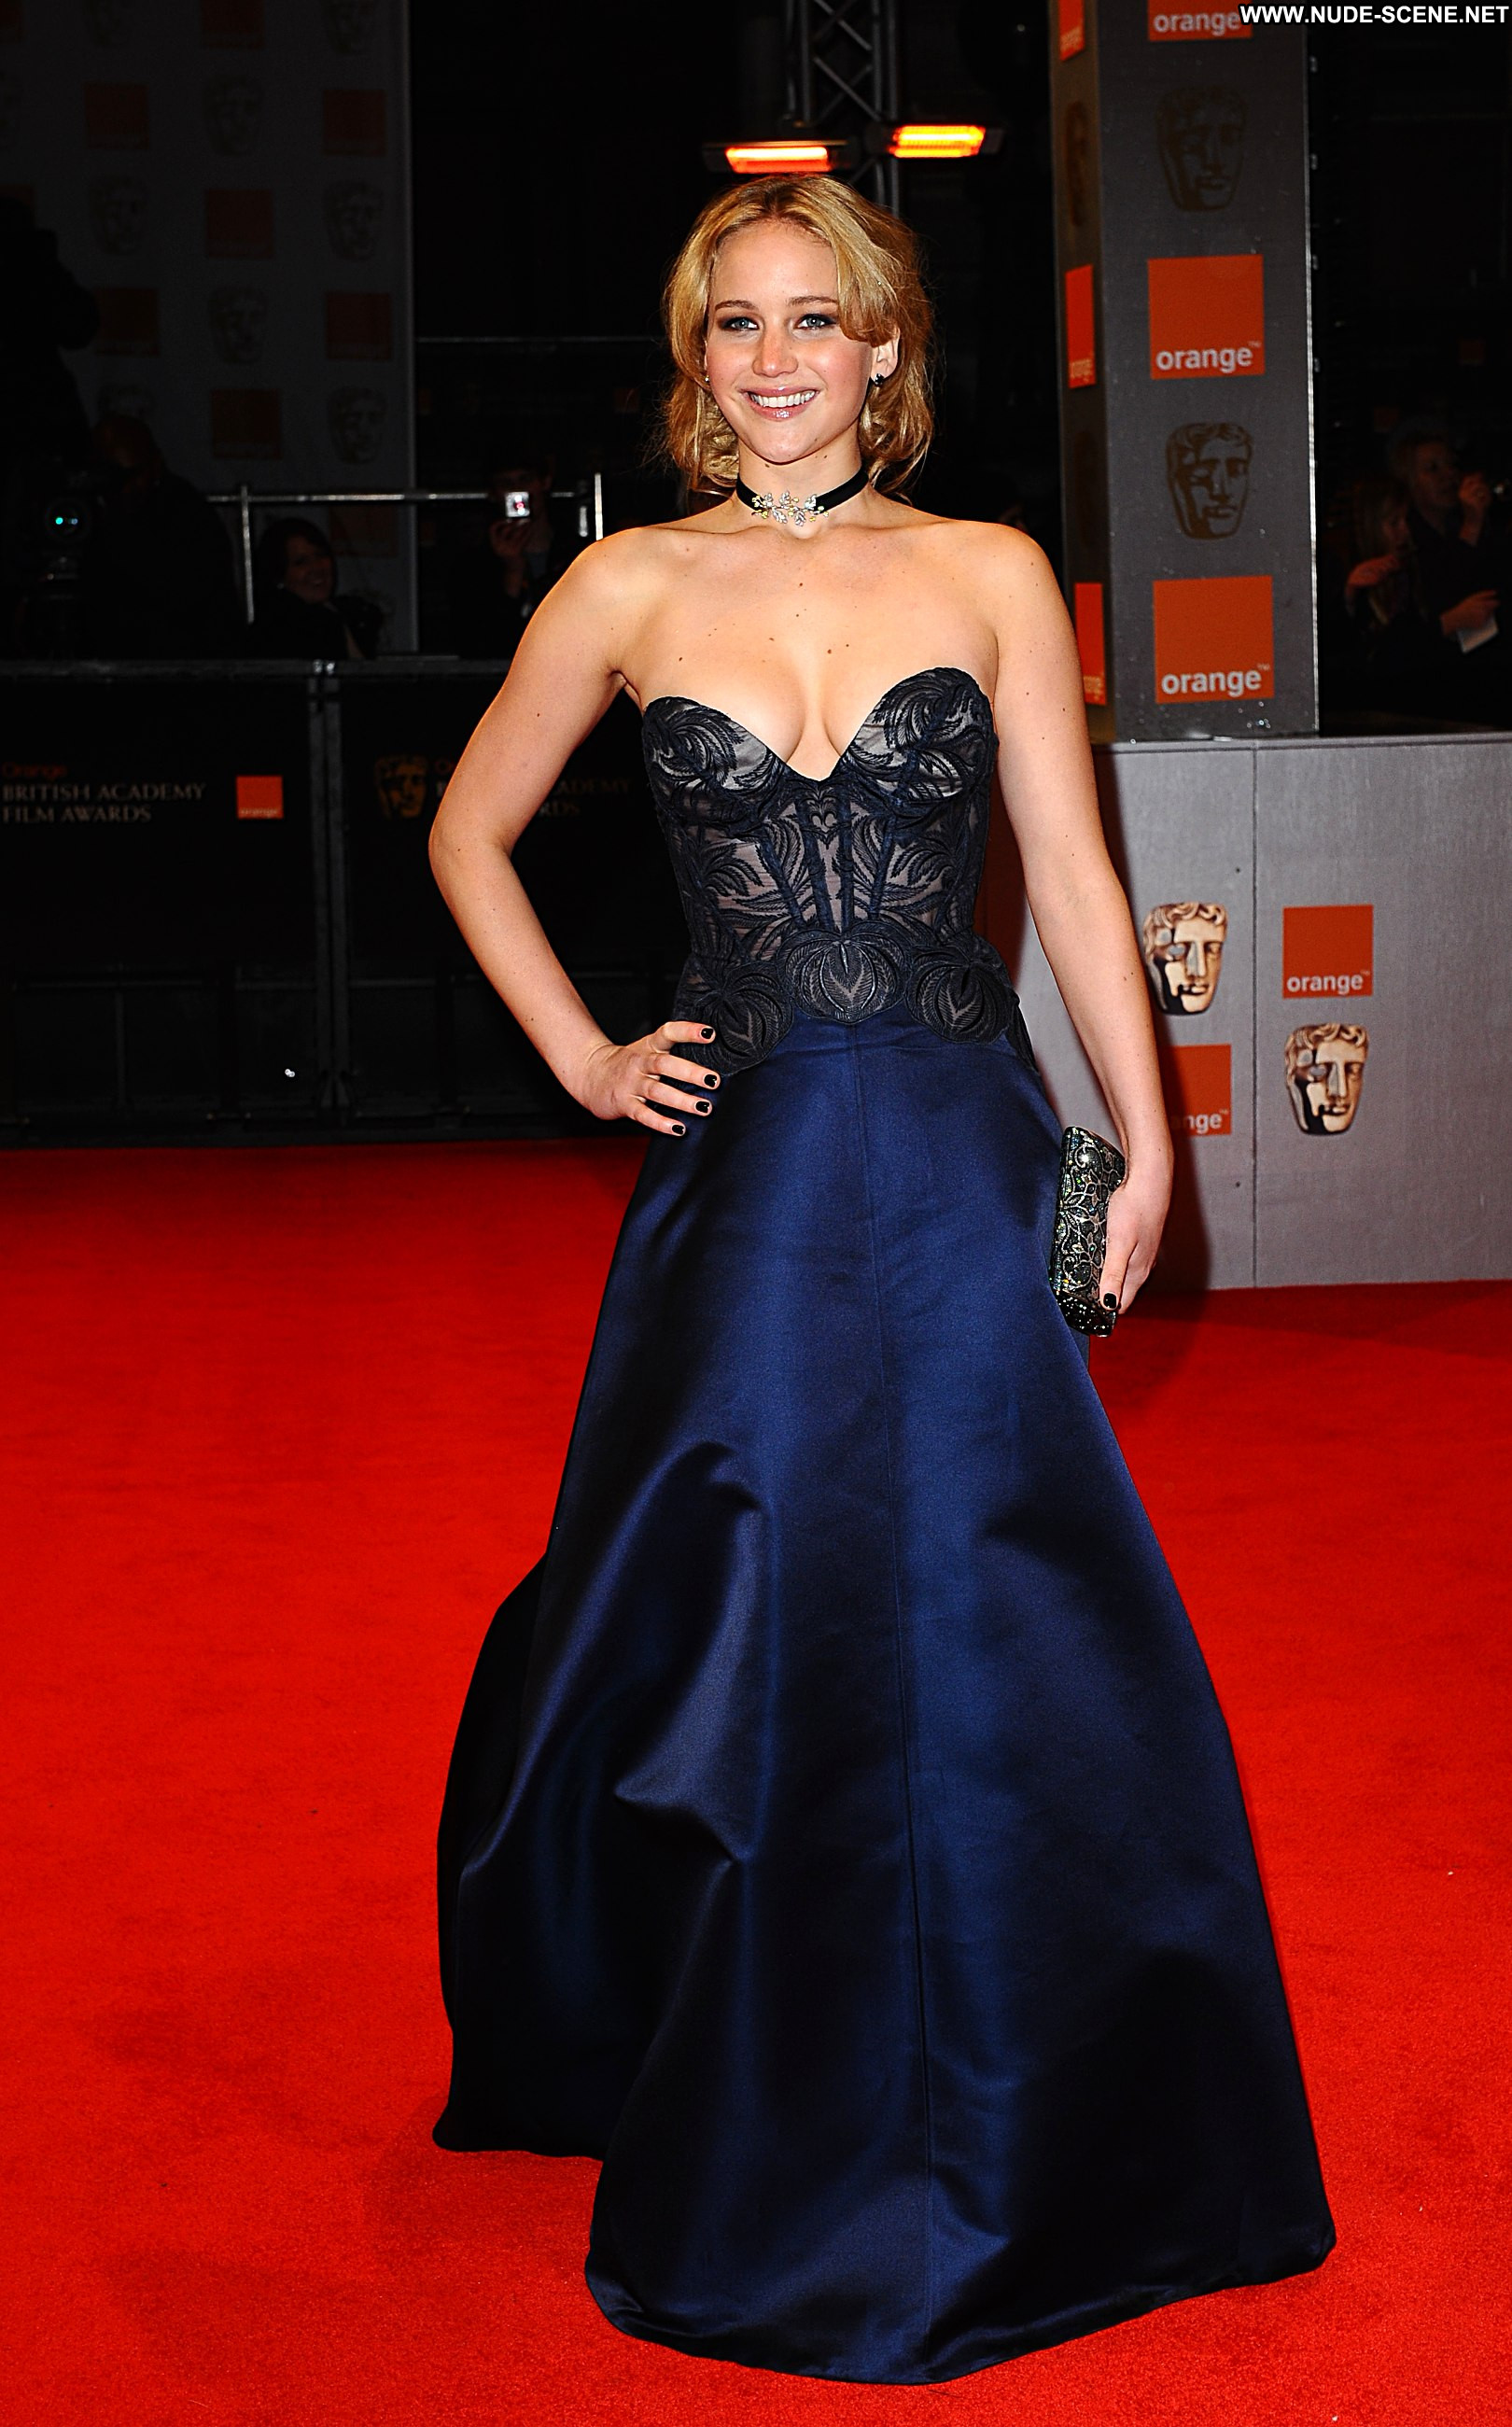 Jennifer Lawrences on-set nudity made folk uncomfortable